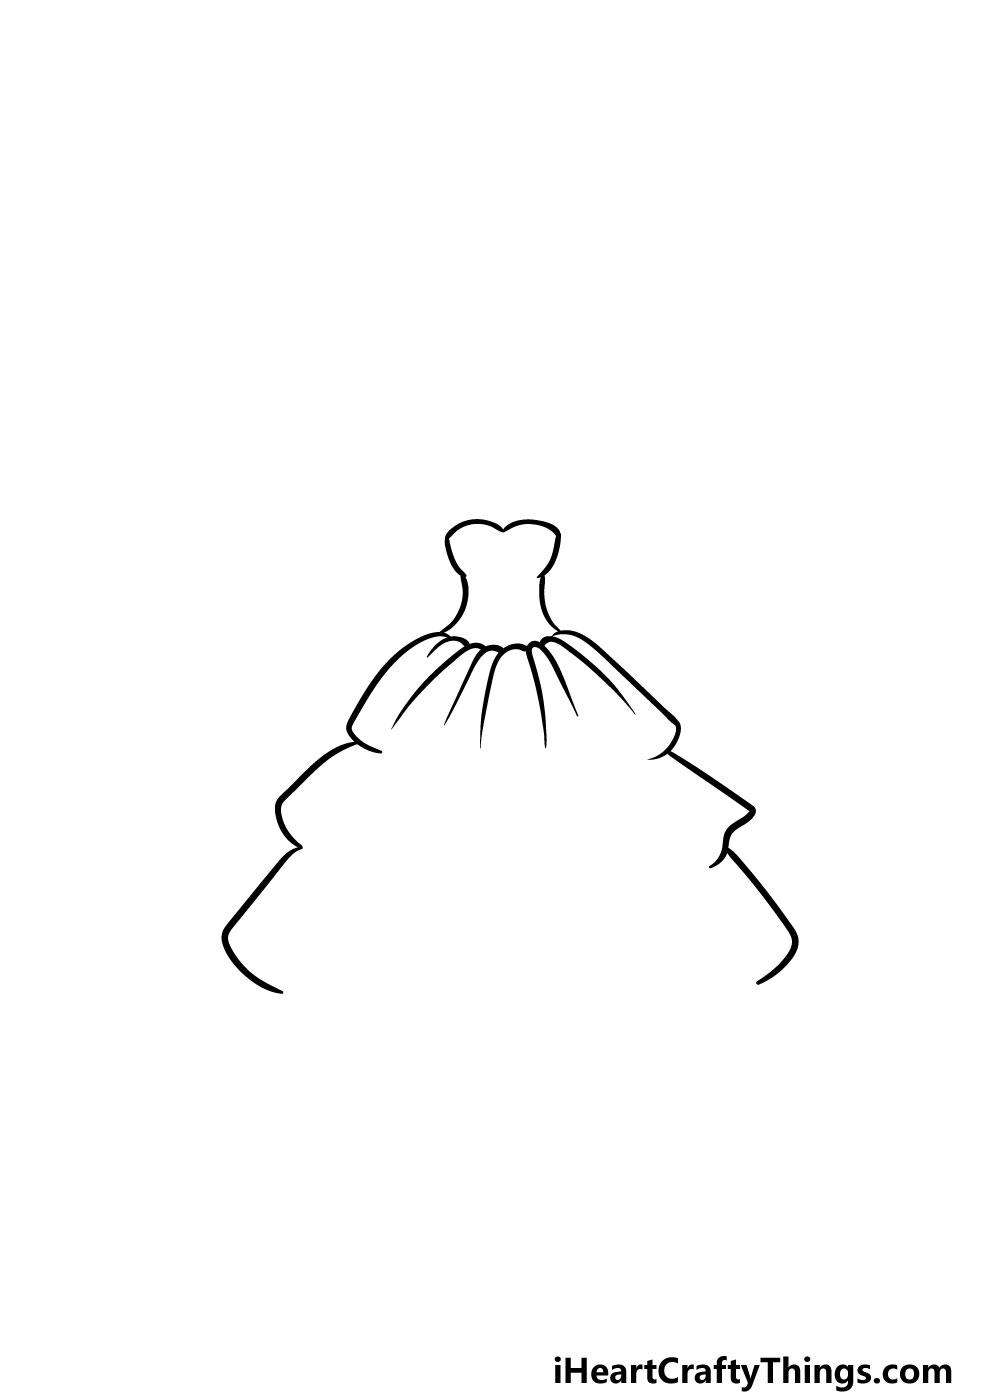 drawing ruffles step 3